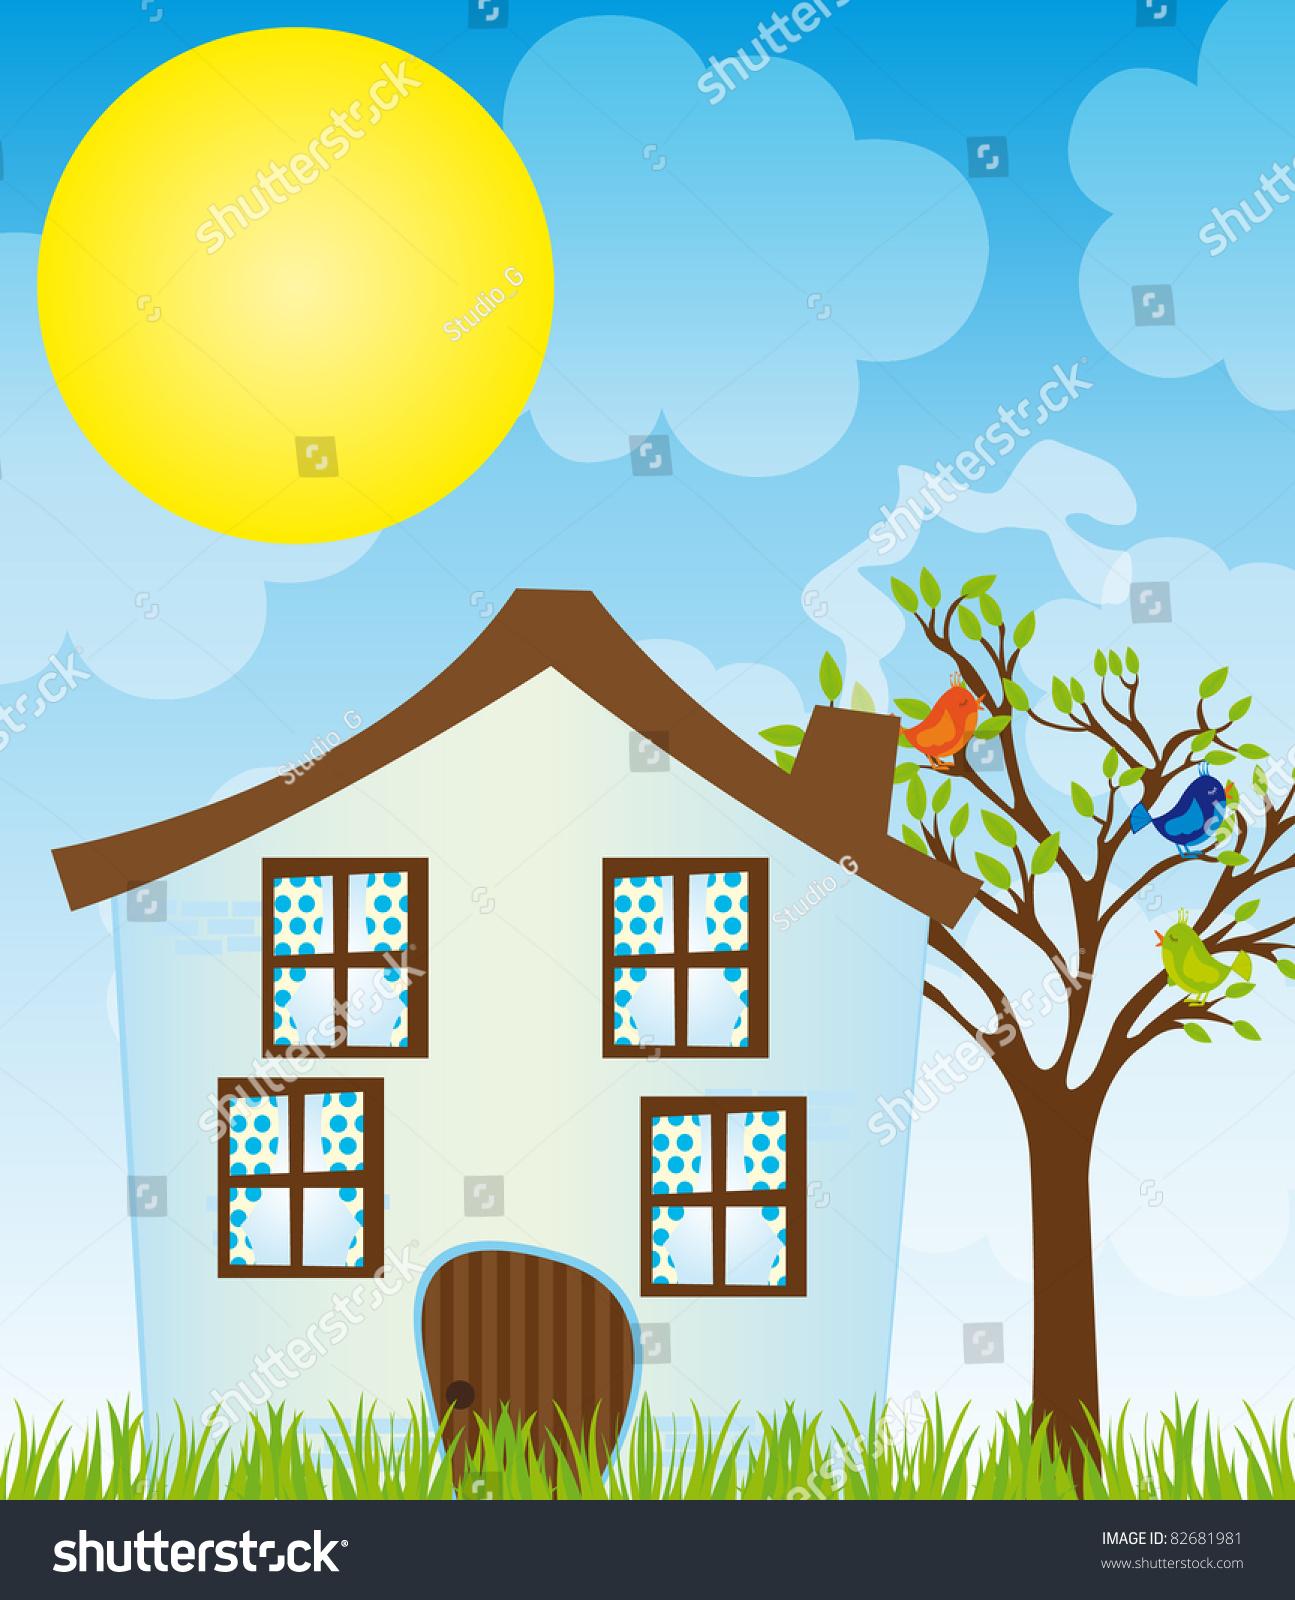 Blue Cartoon House Treebirdsgrass Over Sky Stock Vector